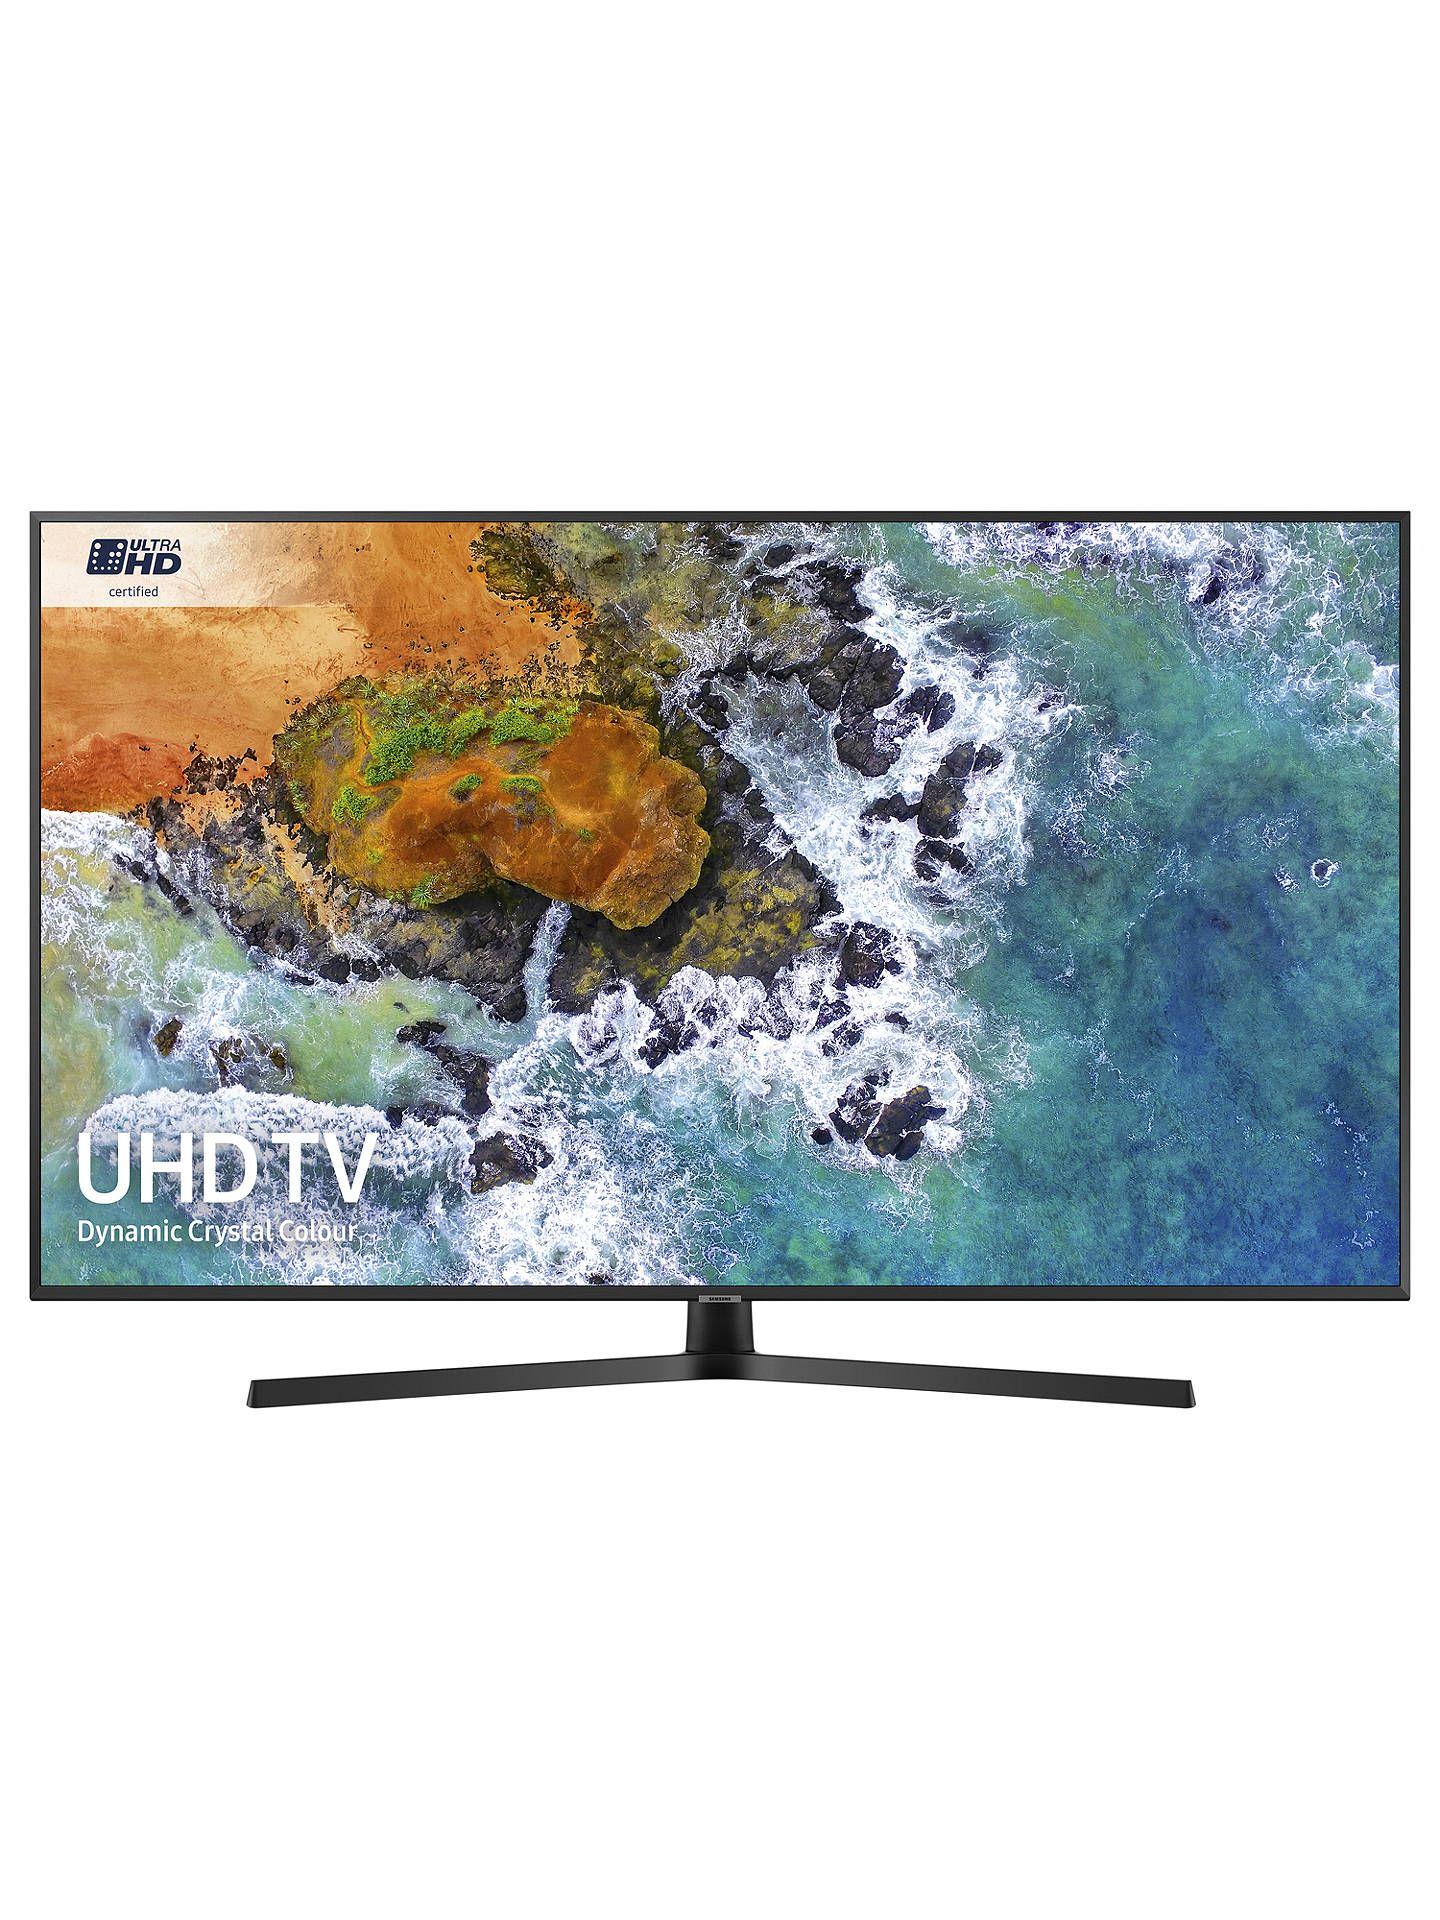 Samsung Ue43nu7400 Hdr 4k Ultra Hd Smart Tv 43 Samsung Smart Tv Smart Tv Samsung Tvs